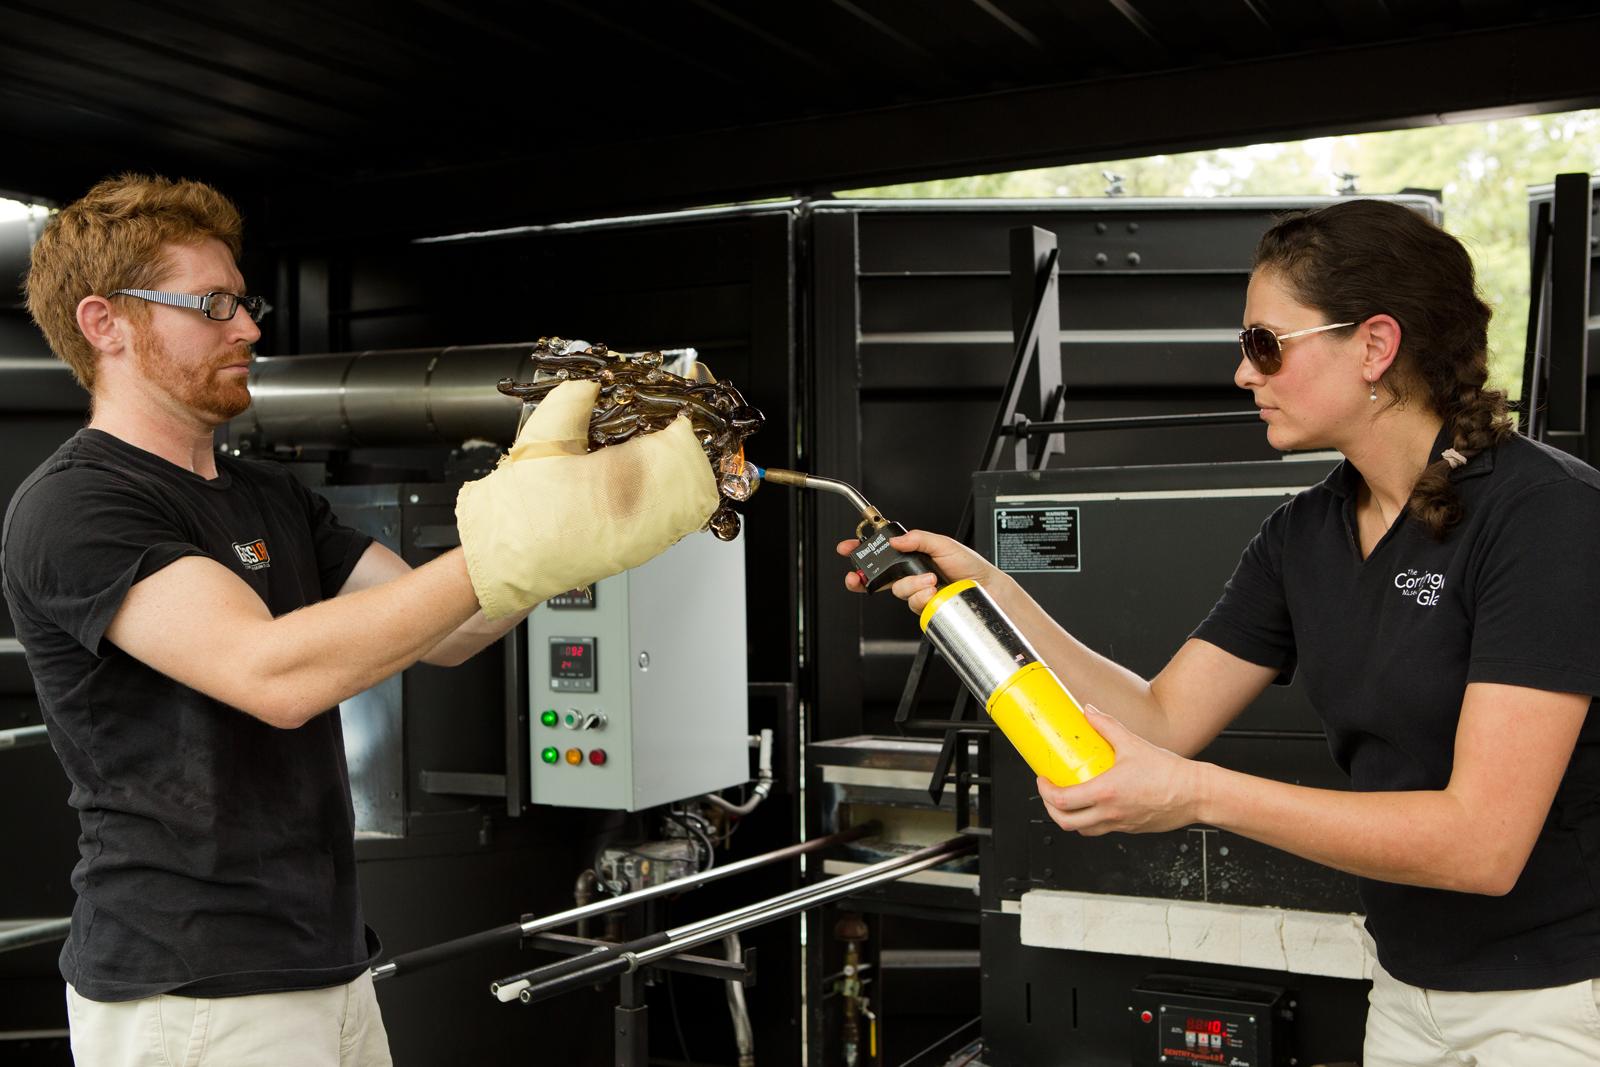 Glassmakers Dane Jack and Annette Sheppard work with designer Michele Oka Doner at GlassLab in Corning, August 2012